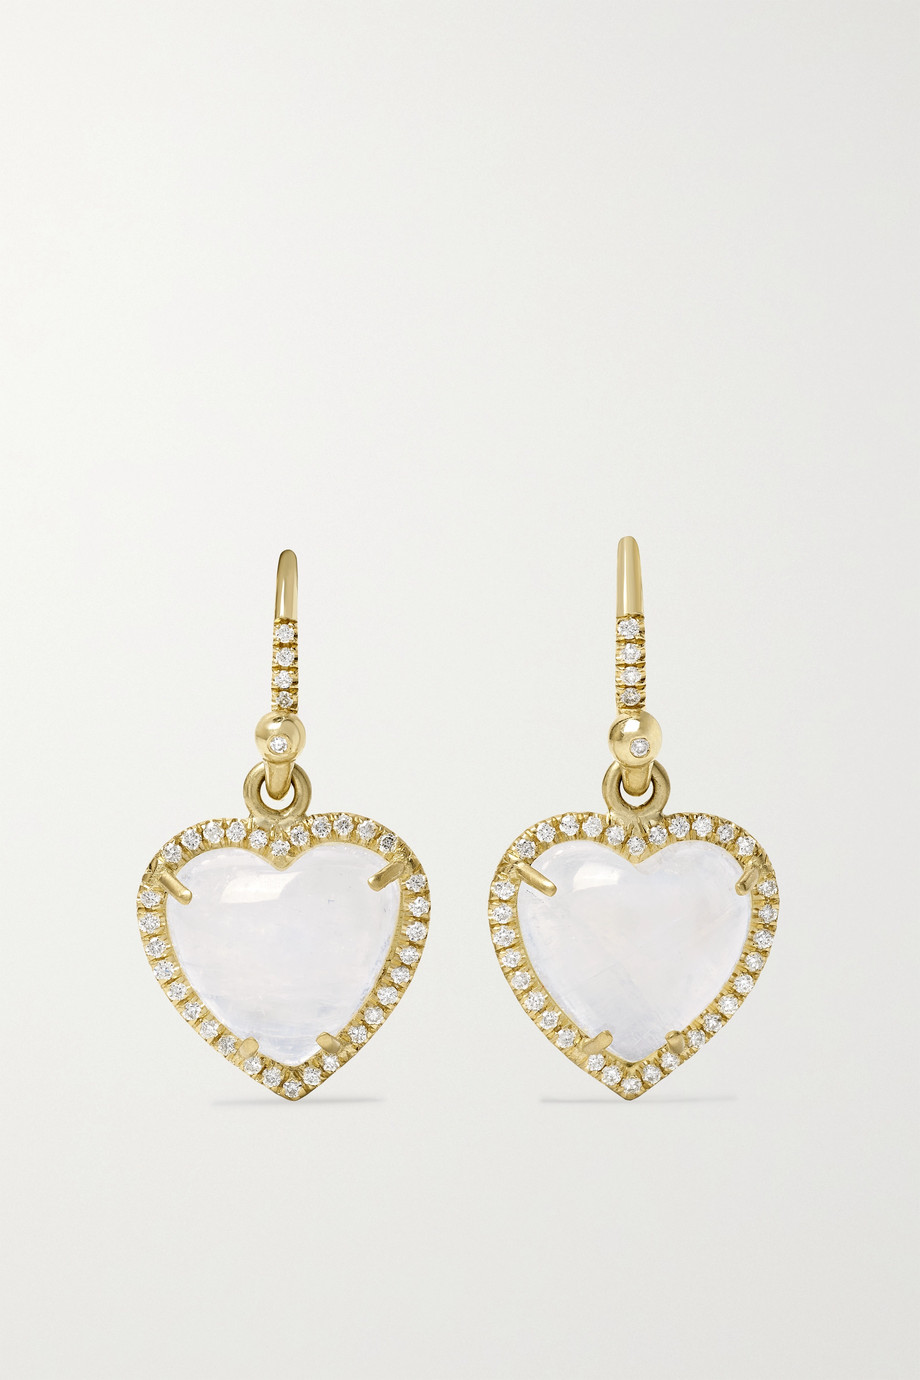 Irene Neuwirth Love 18-karat gold, moonstone and diamond earrings